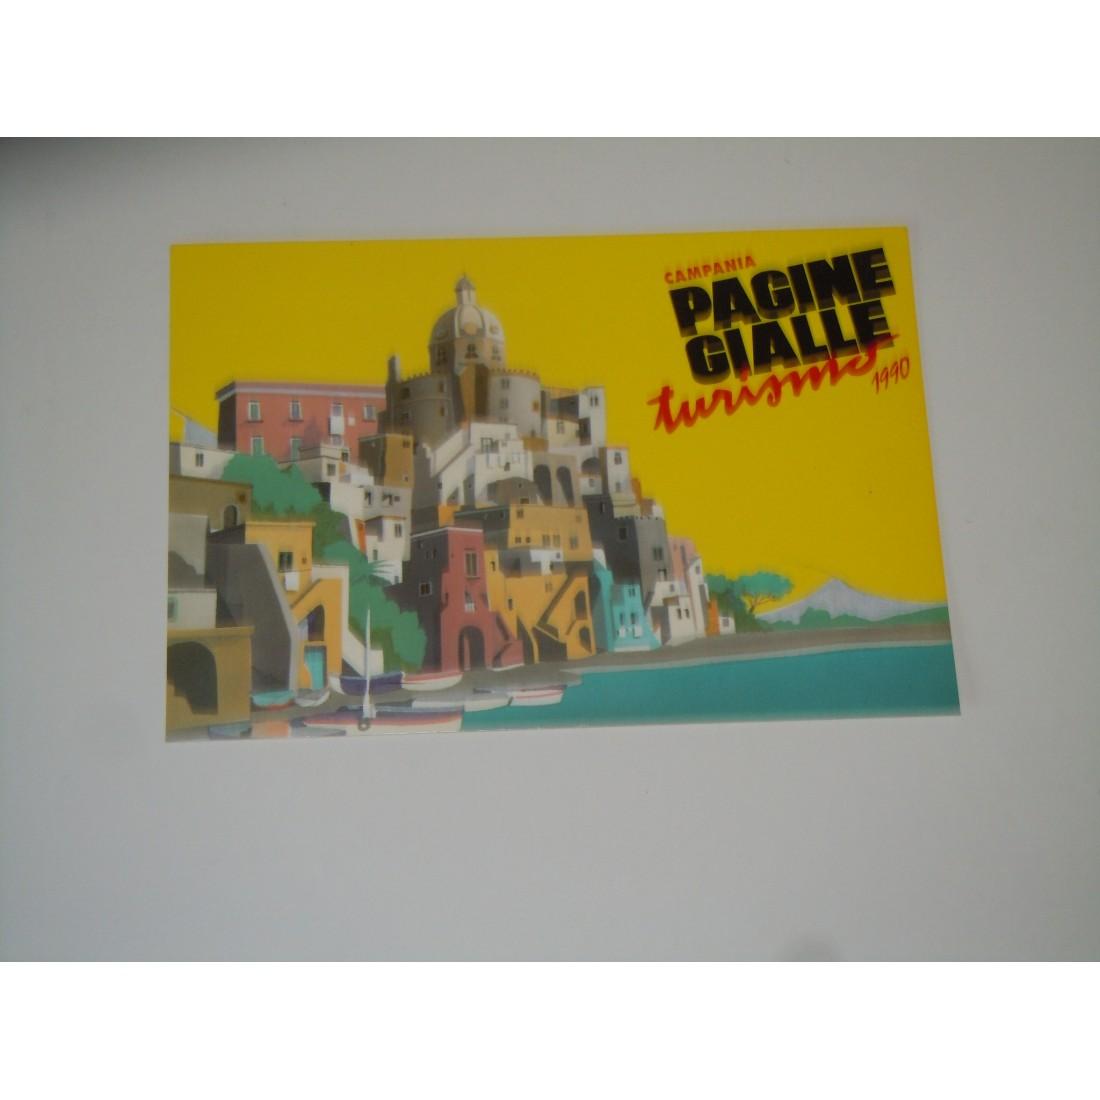 Cartolina seat pagine gialle turismo 1990 Campania l'Isola ...